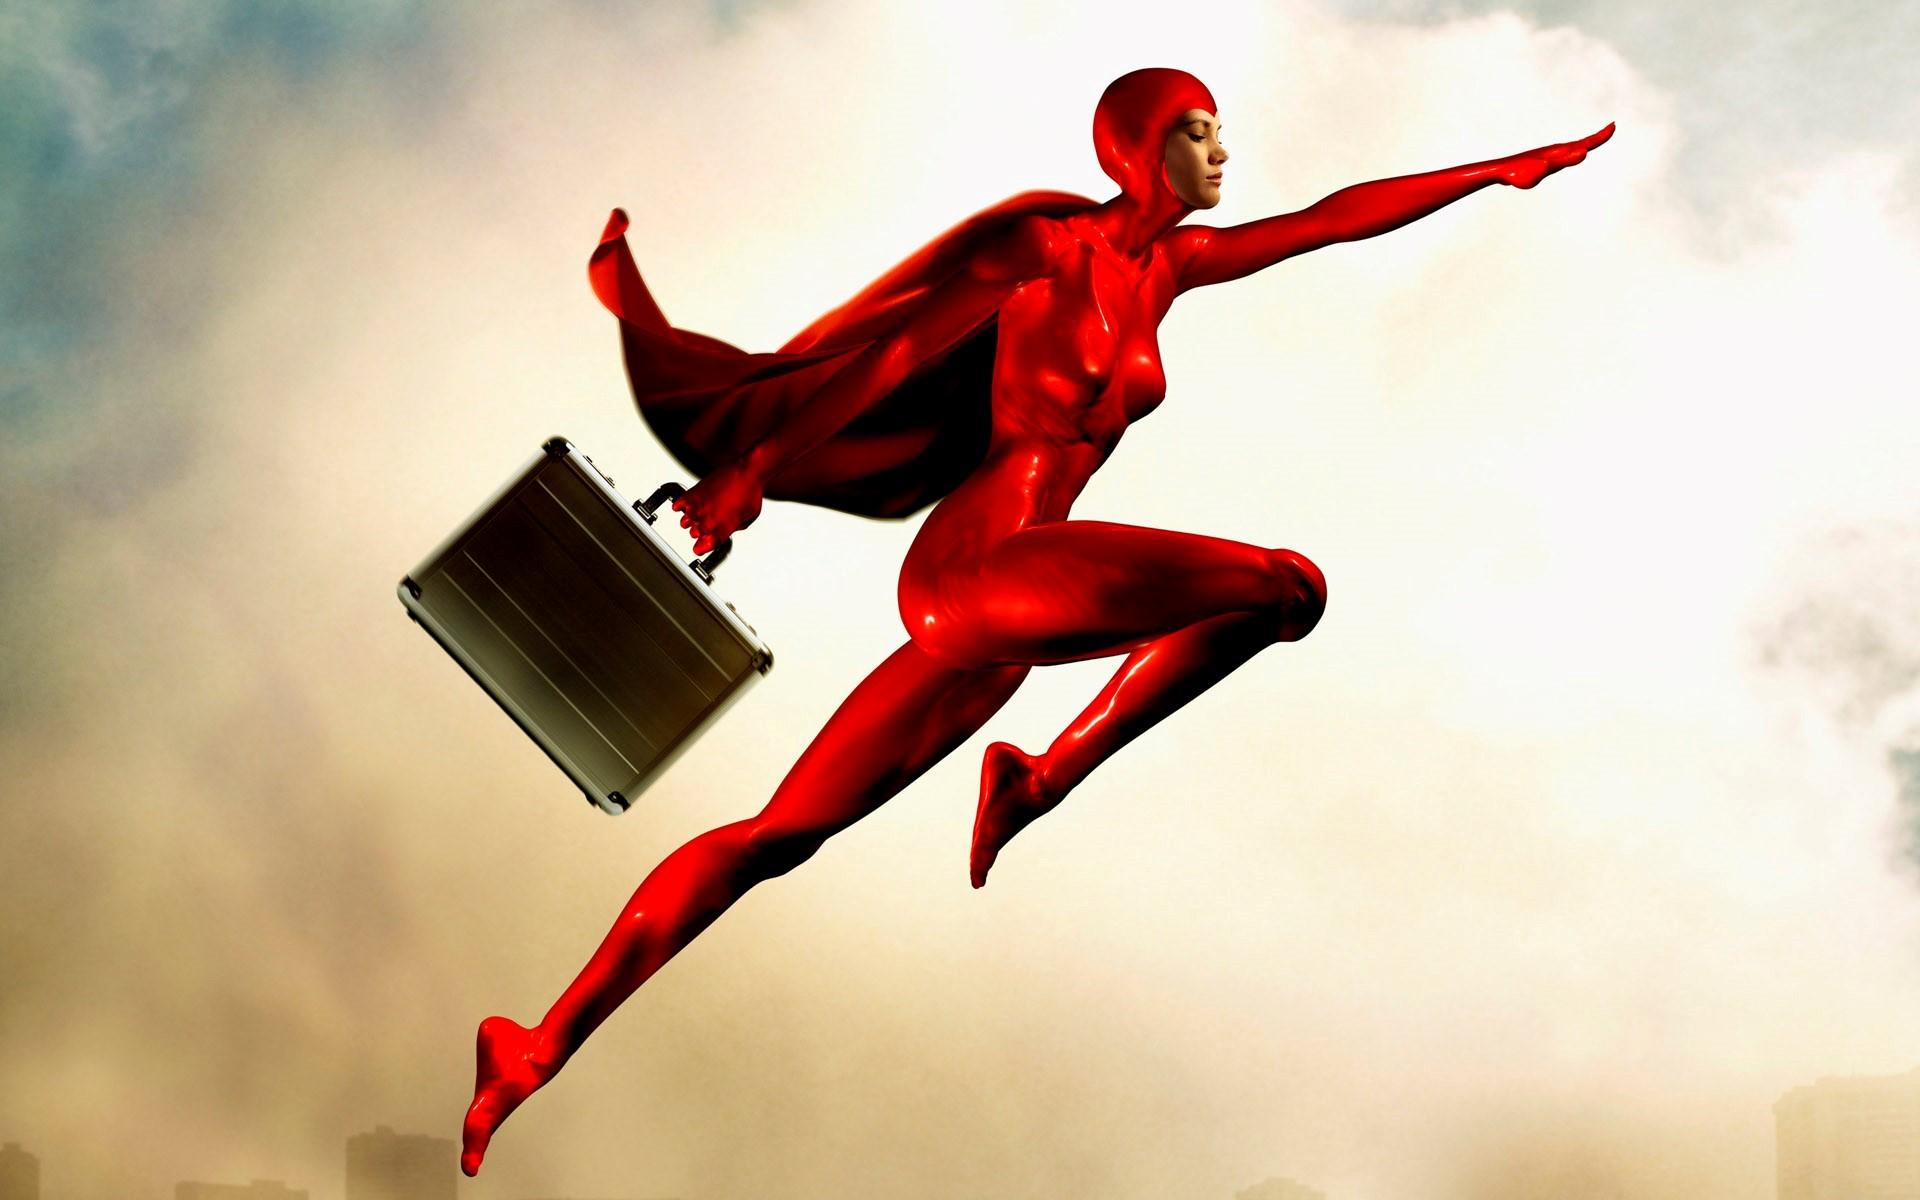 Free Superhero Wallpapers For Laptops